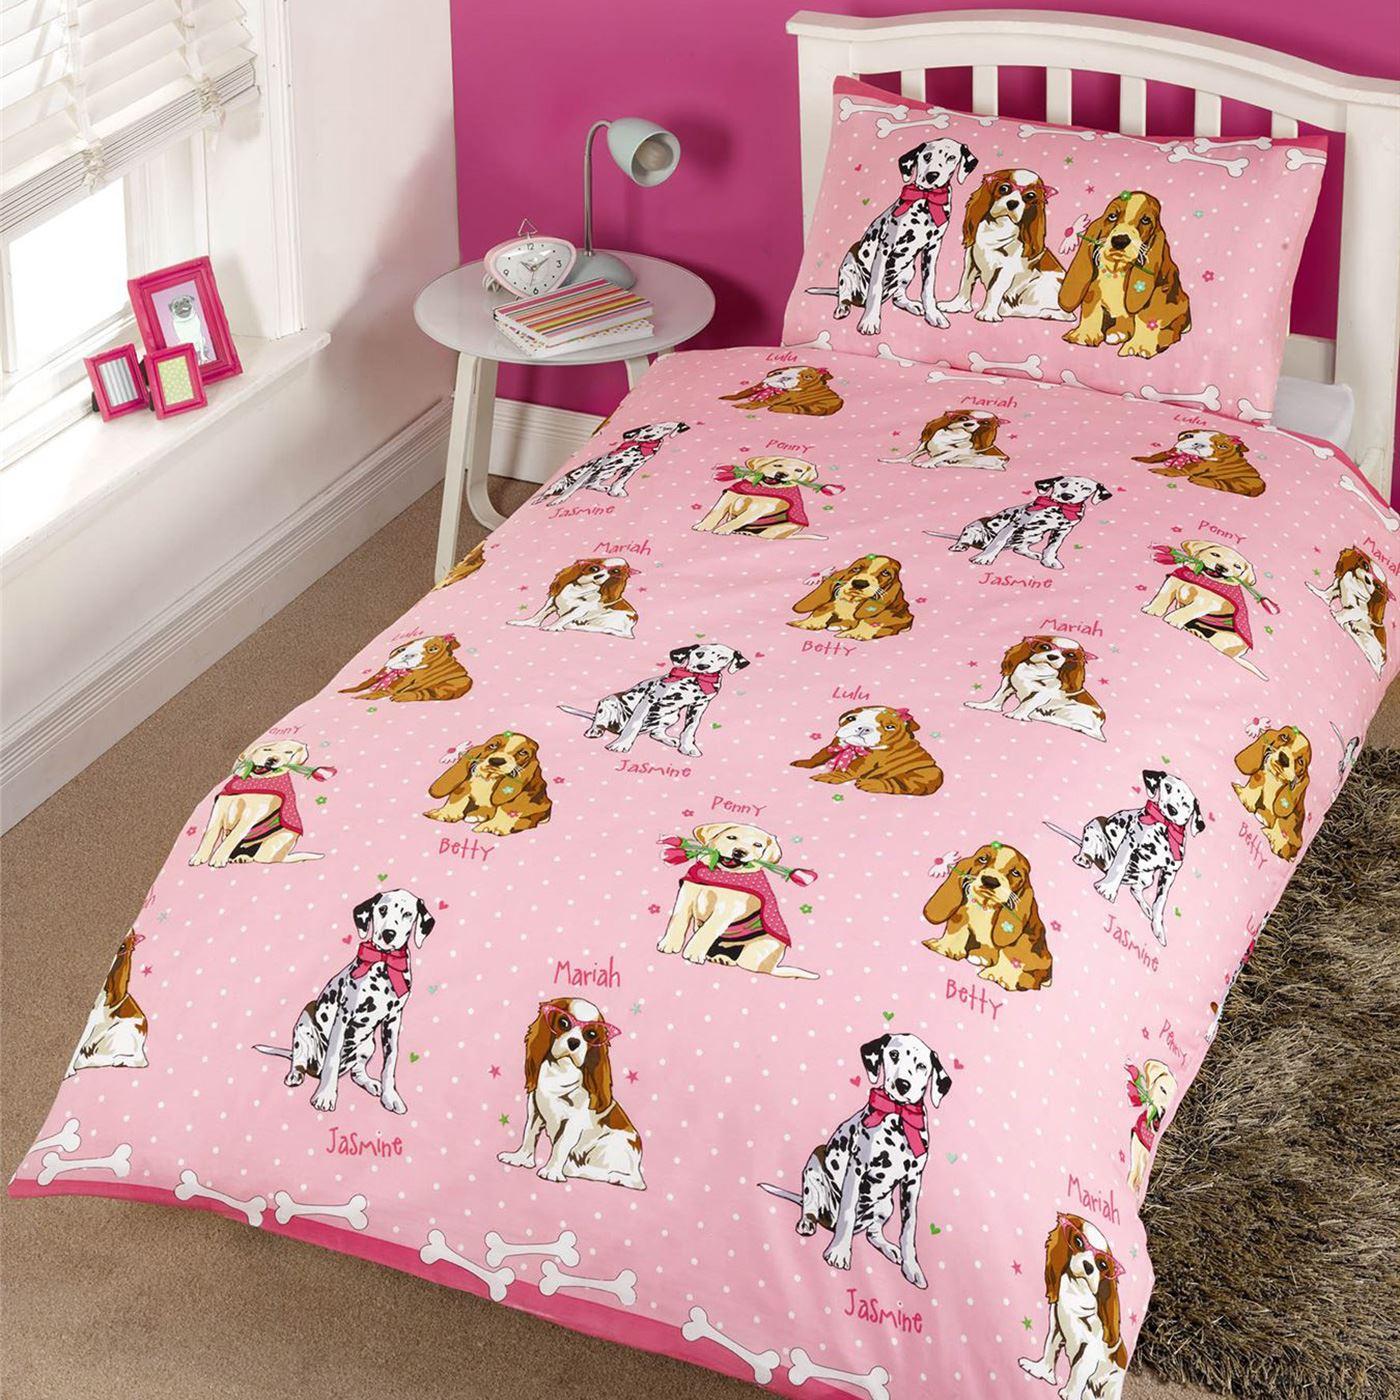 Ni a edred n individual juego de ropa cama unicornio flor for Cama unicornio